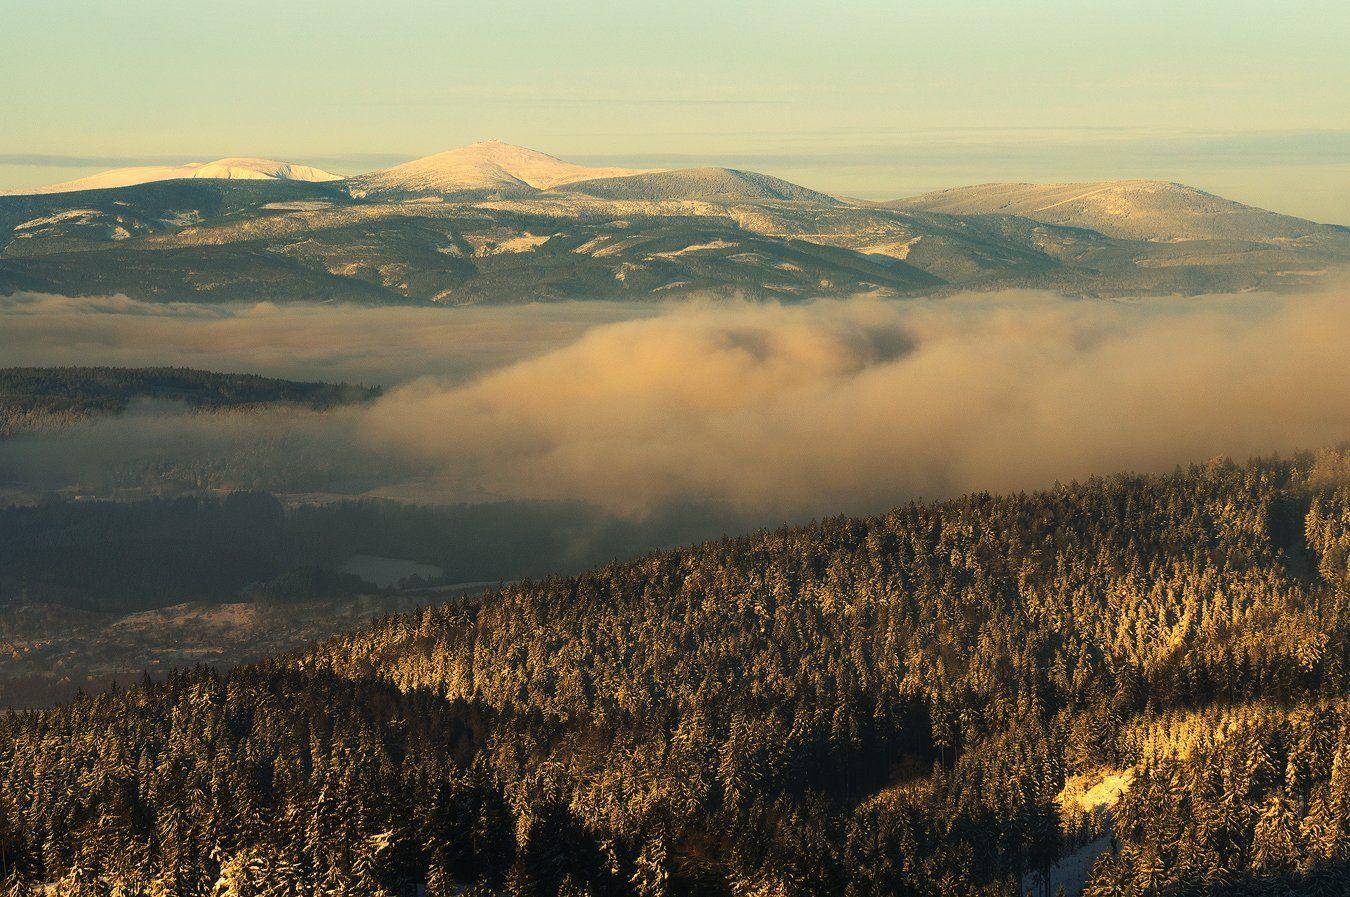 , Fog, Gold hour, Mist, mountains, Poland, Sunrise, Winter, Robert